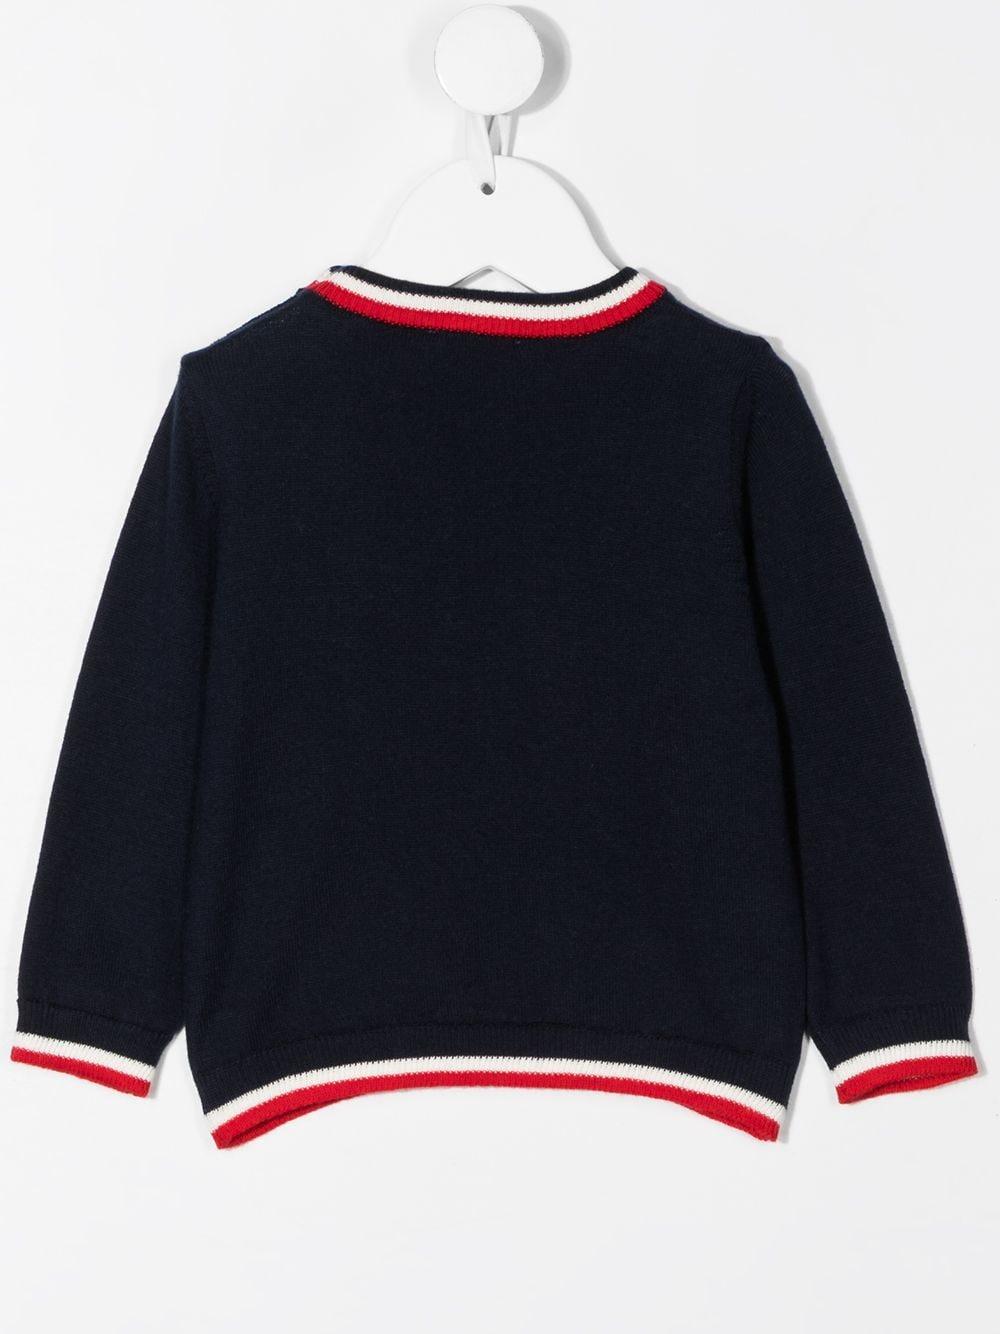 Sweater Fay Junior  FAY JUNIOR | 1 | 5N9300NX190621